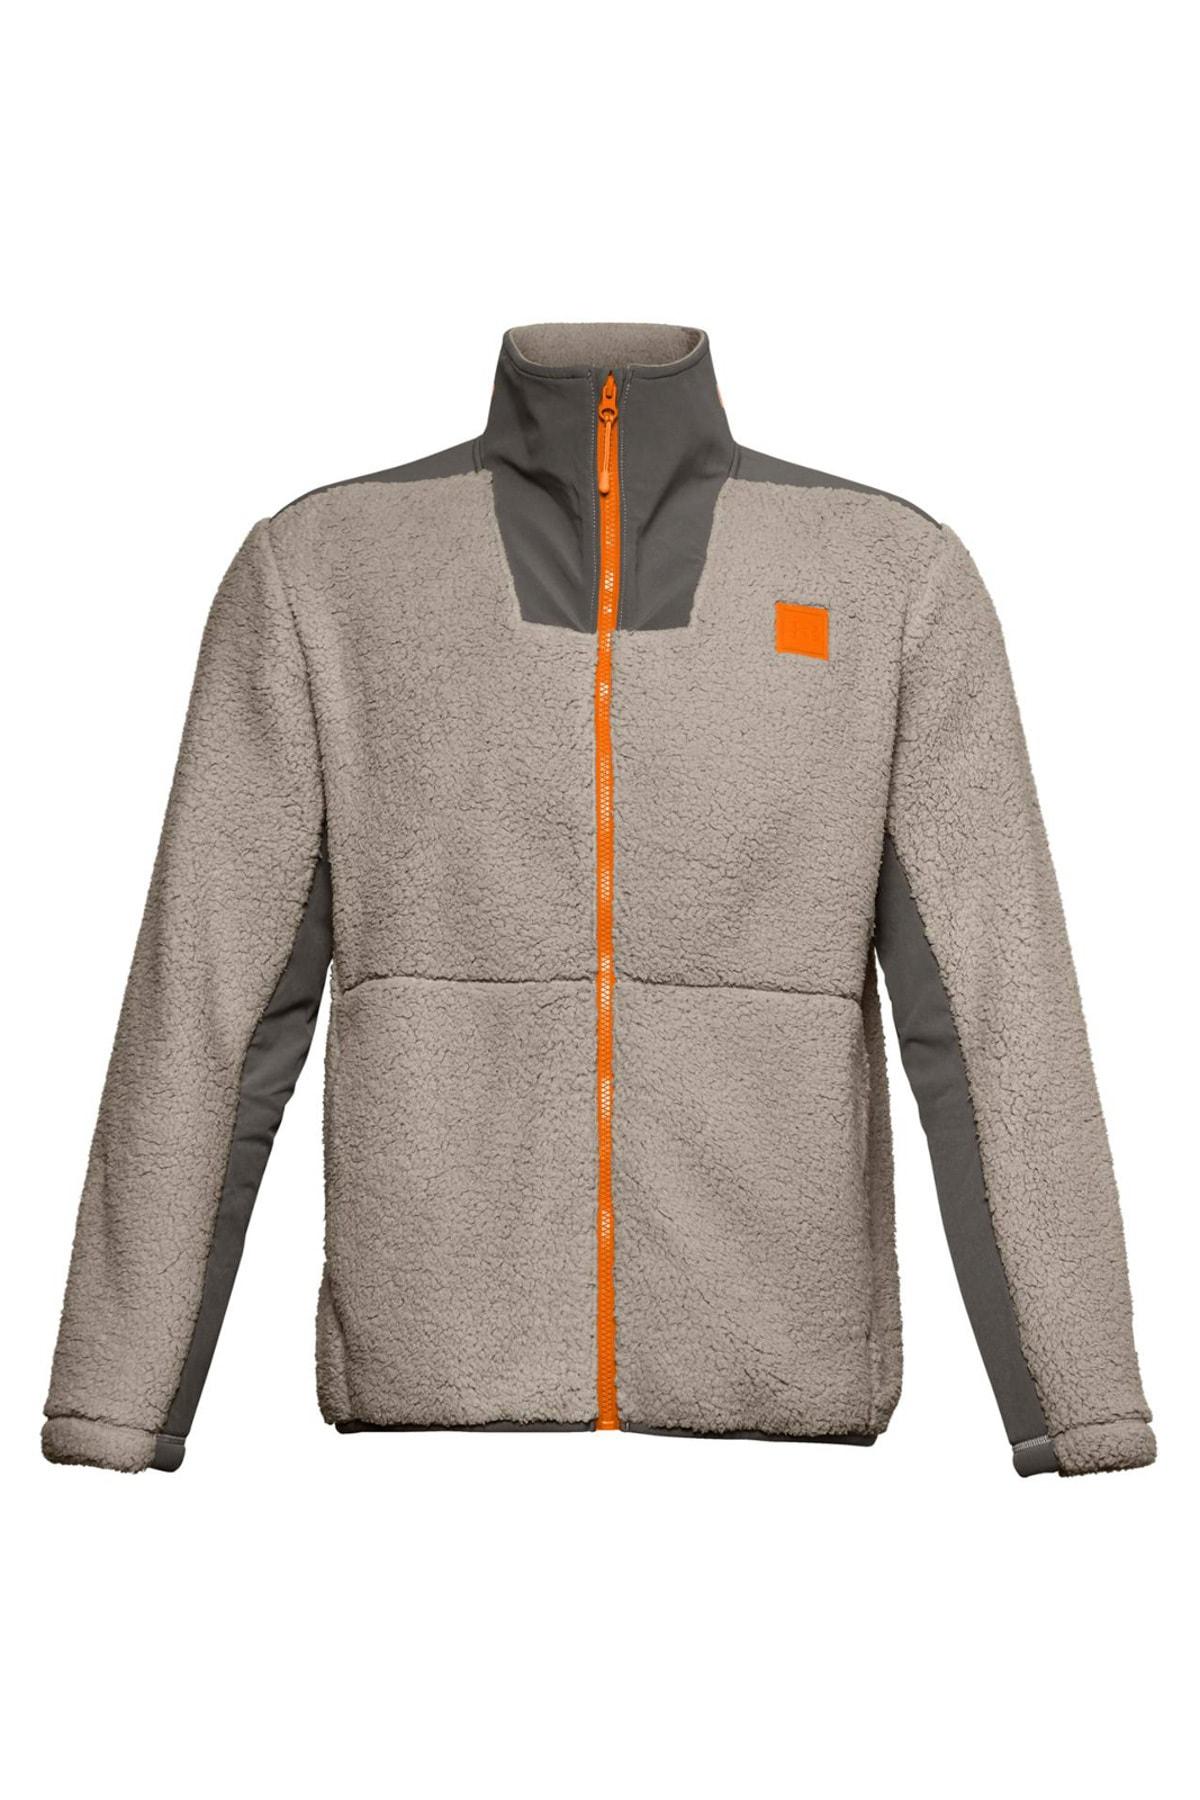 Under Armour Erkek Spor Sweatshirt - Ua Legacy Sherpa Swacket - 1357474-200 1